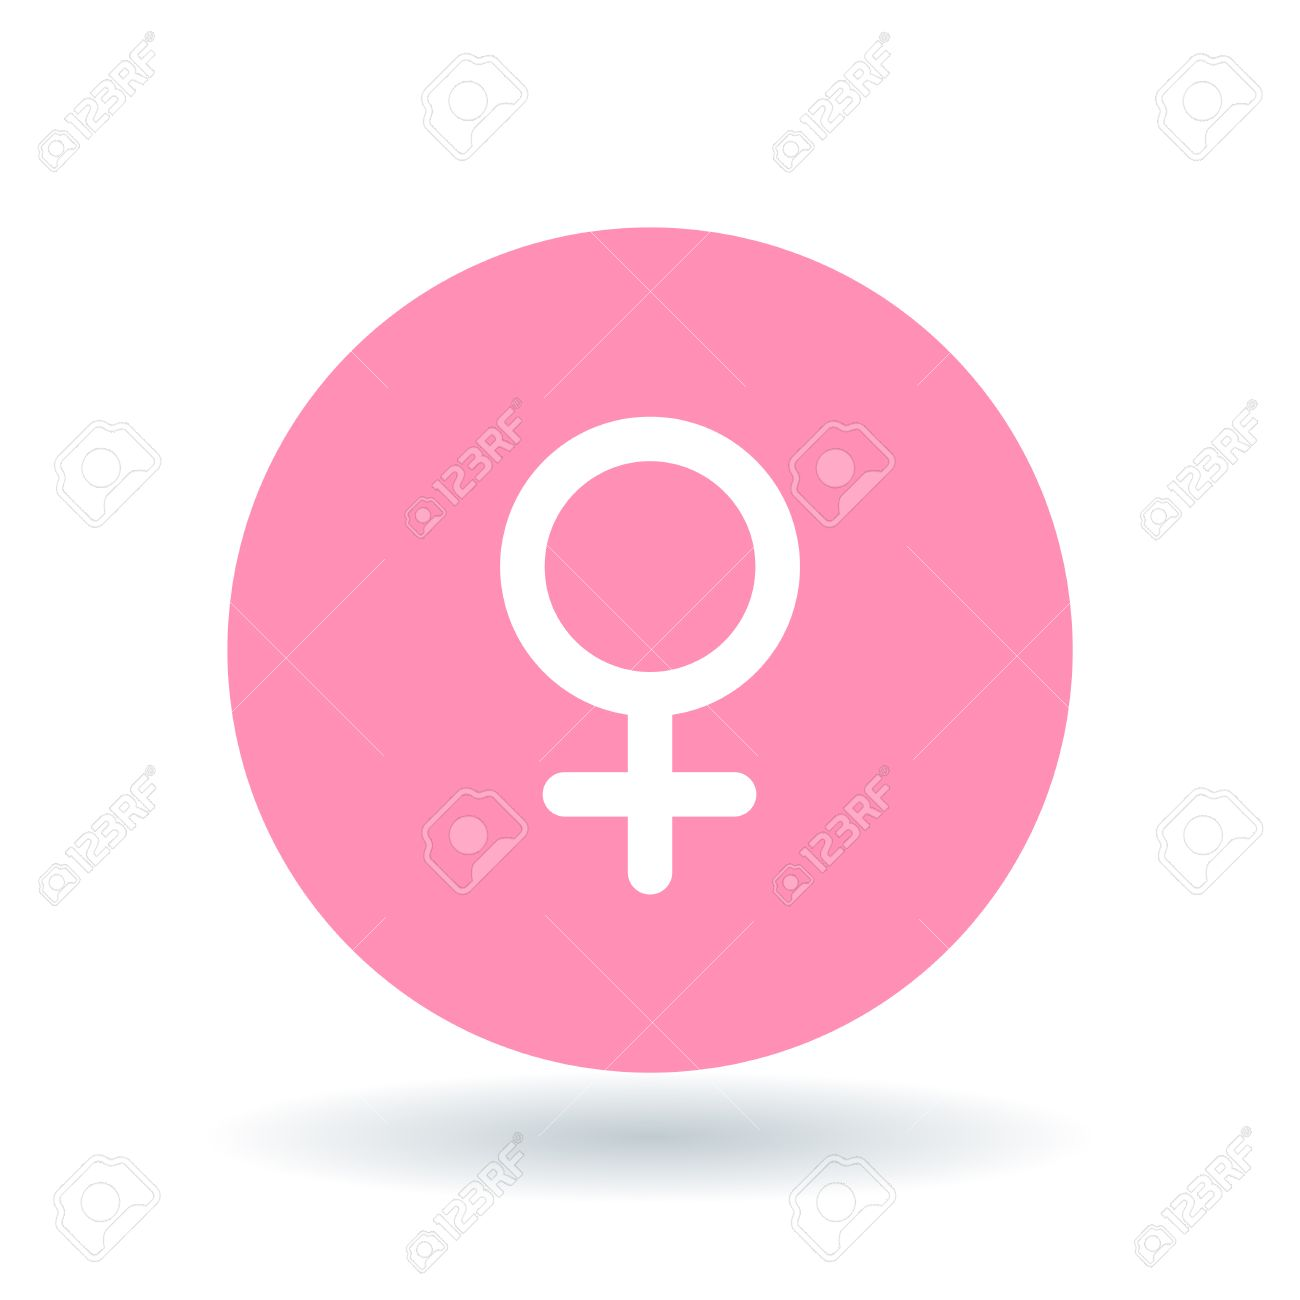 Female Gender Icon Ladies Sign Women Symbol White Female Symbol